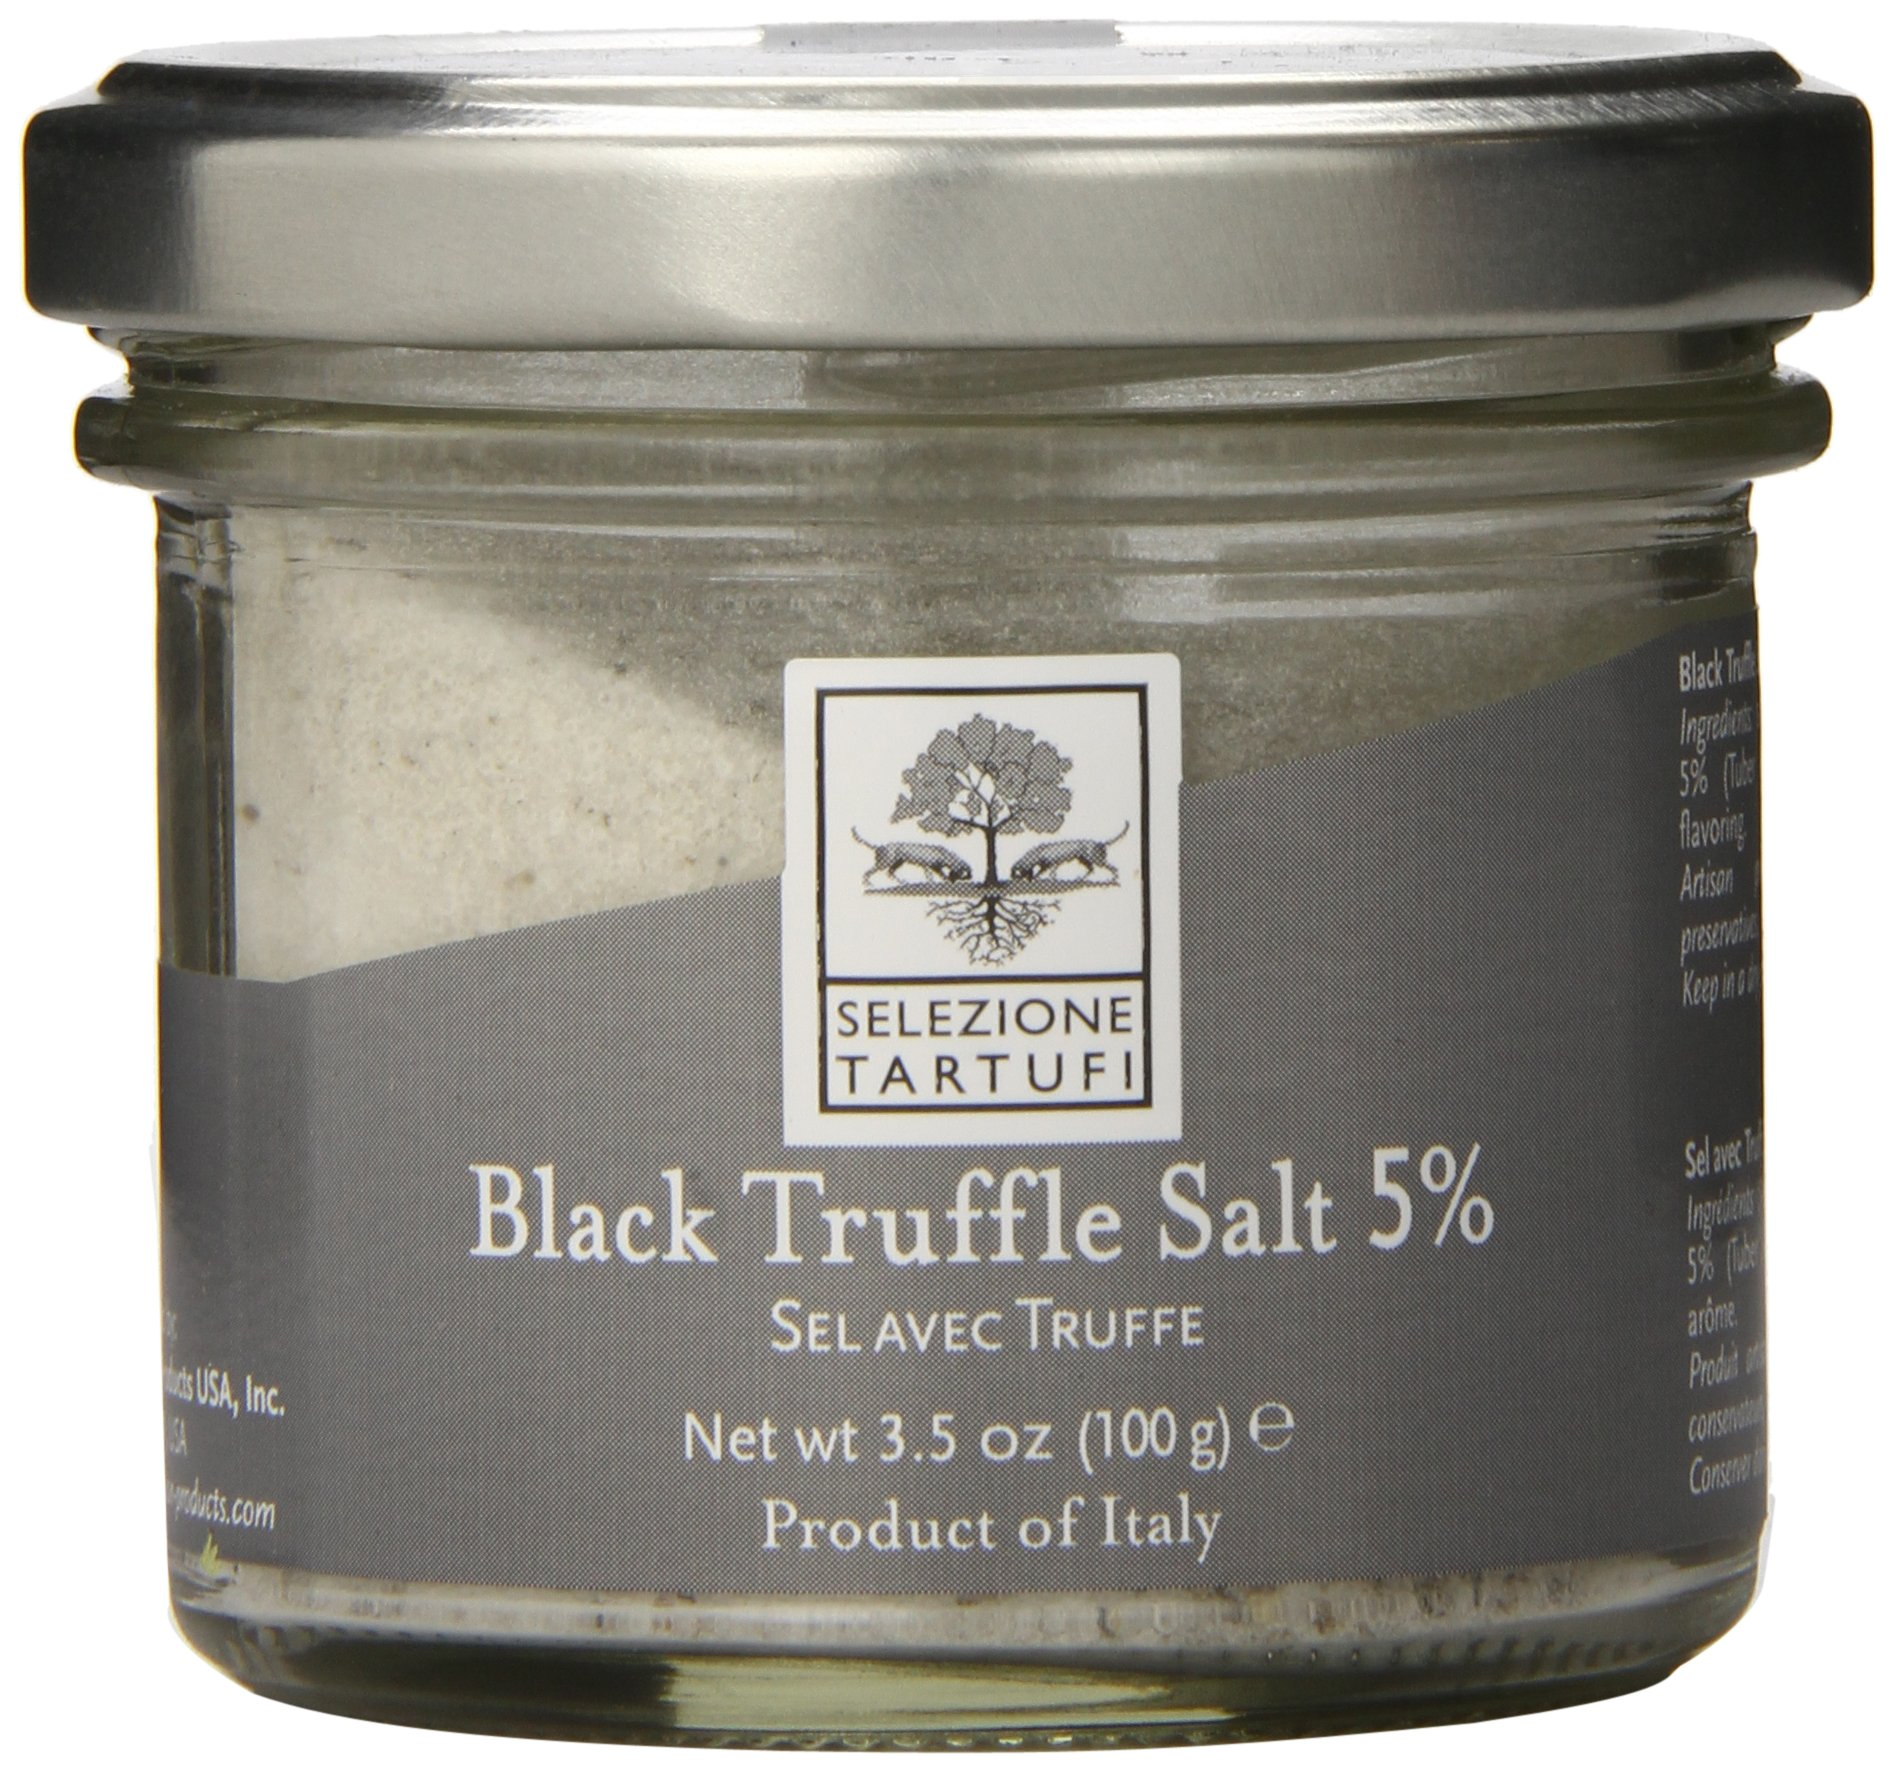 Selezione Tartufi 5% Black Truffle Salt, 3.5 Ounce by Selezione Tartufi